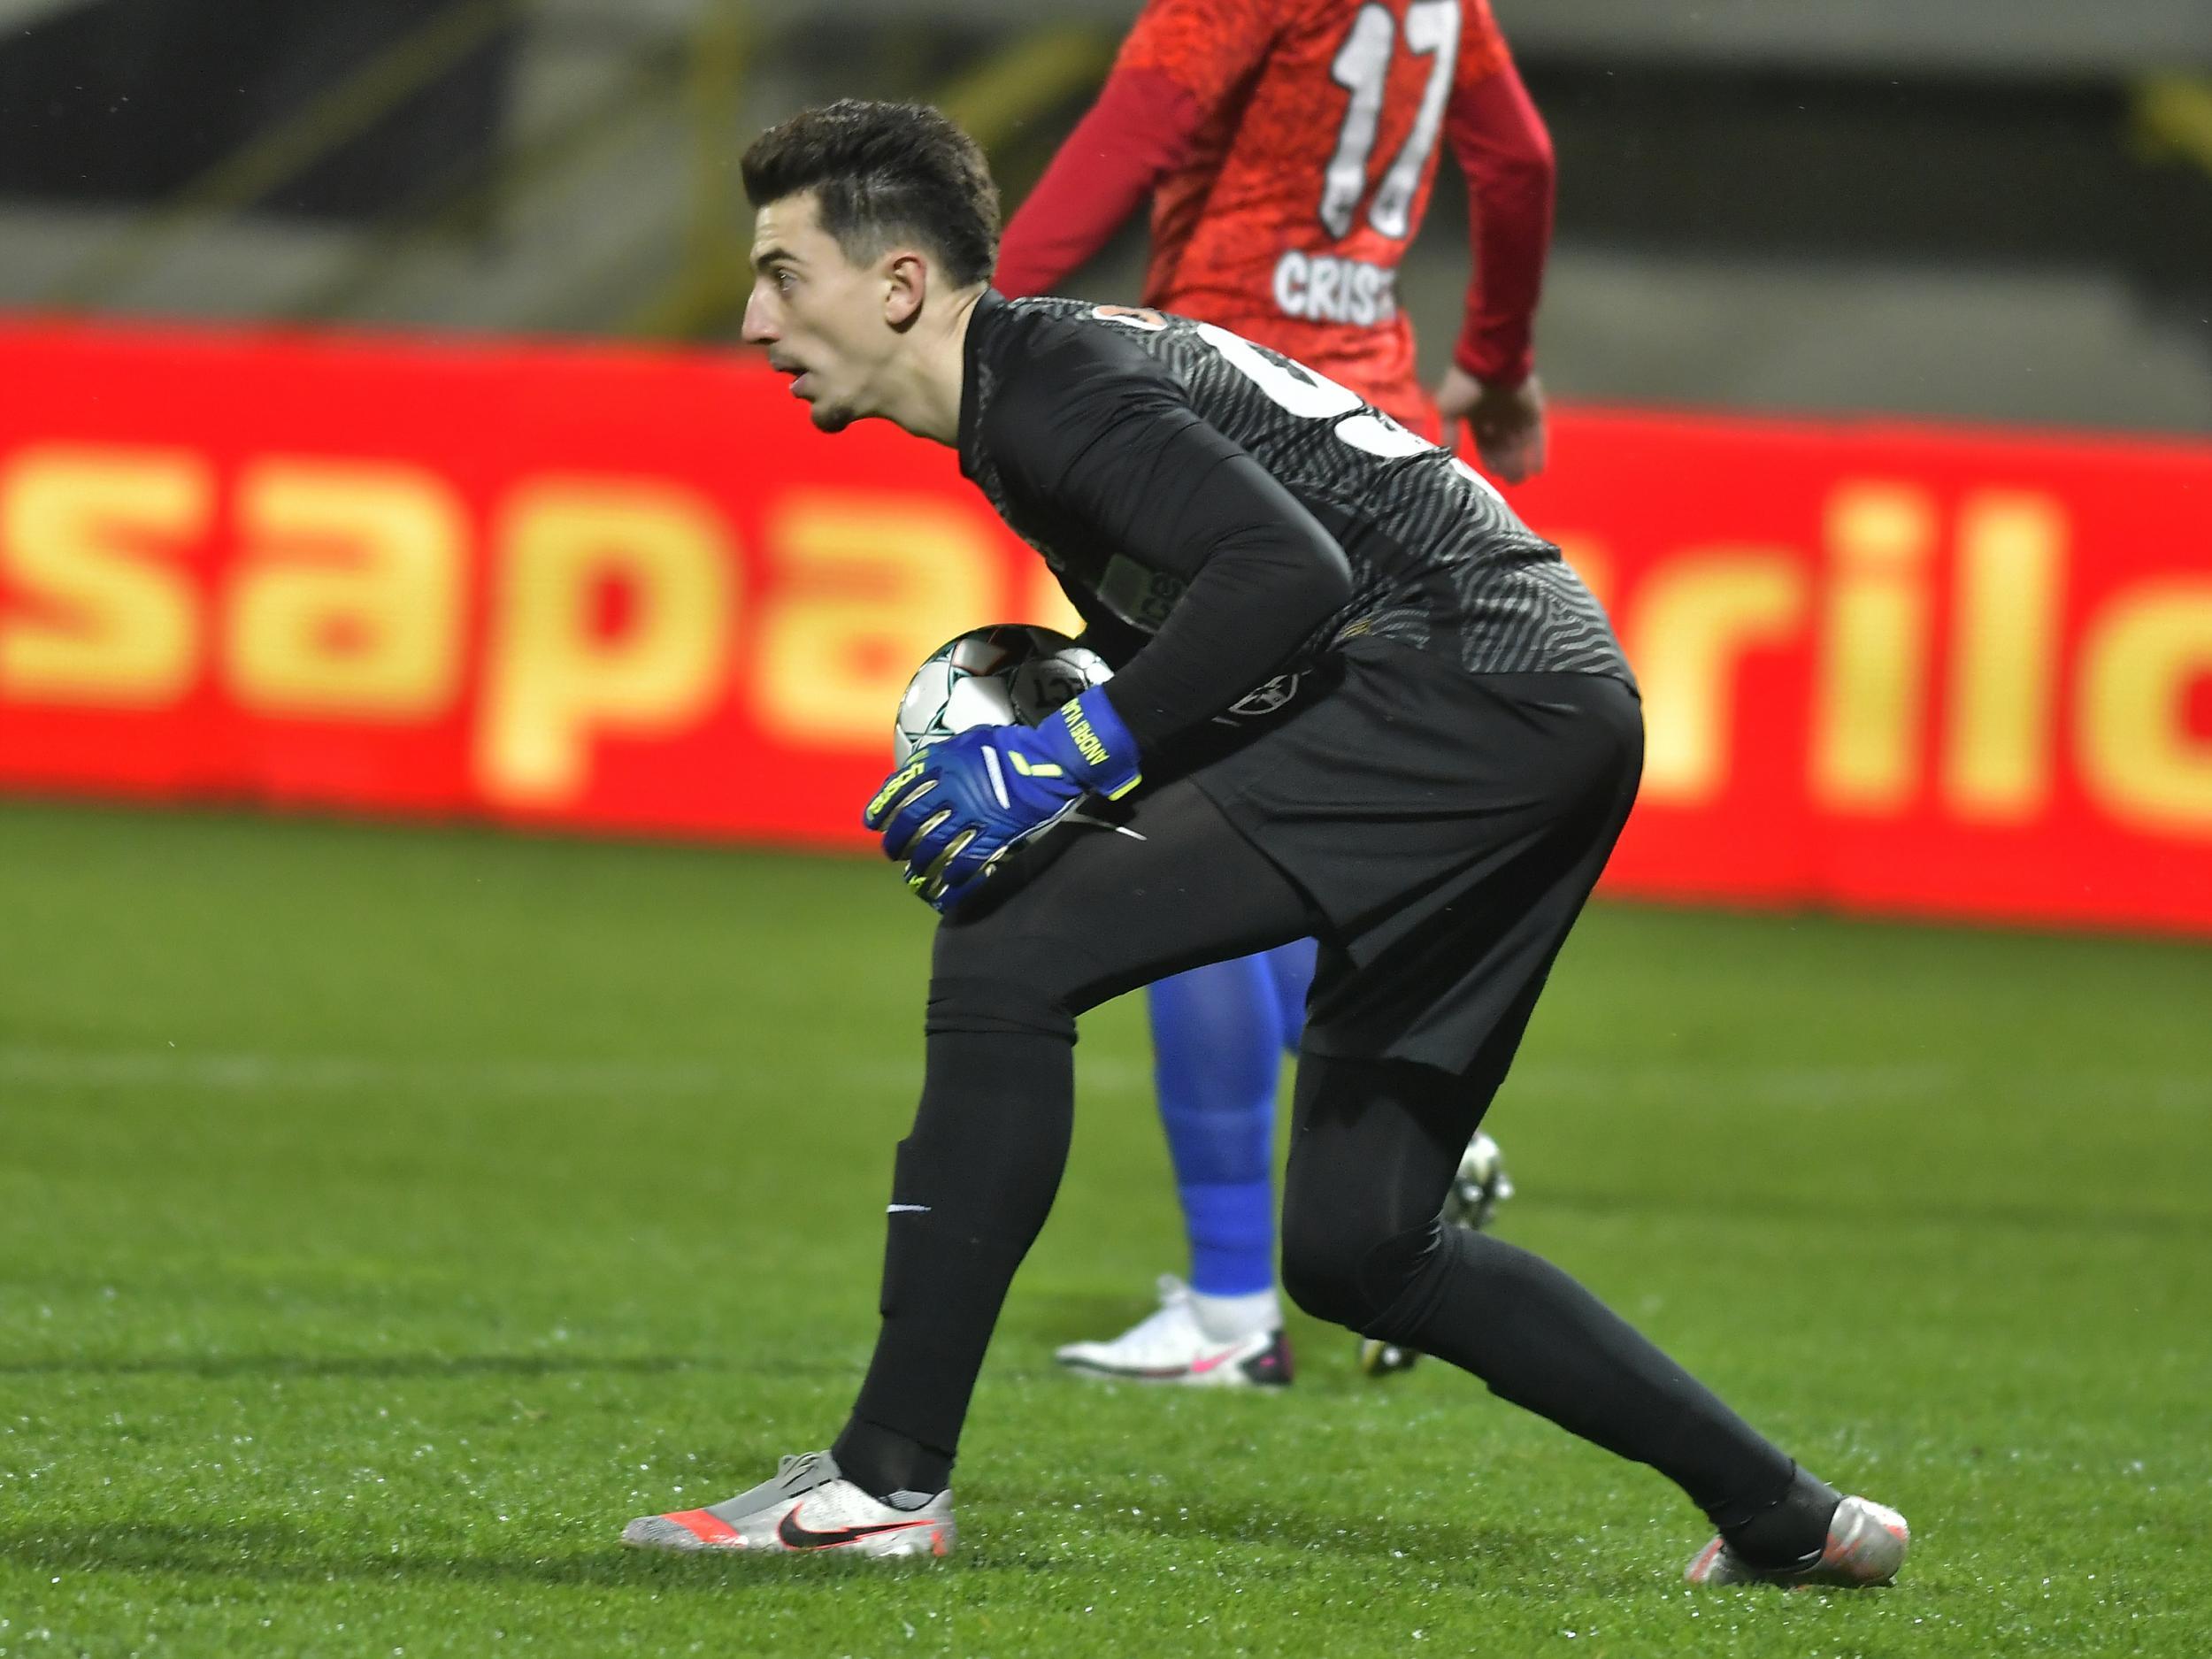 FCSB - UNIVERSITATEA CRAIOVA 0-0